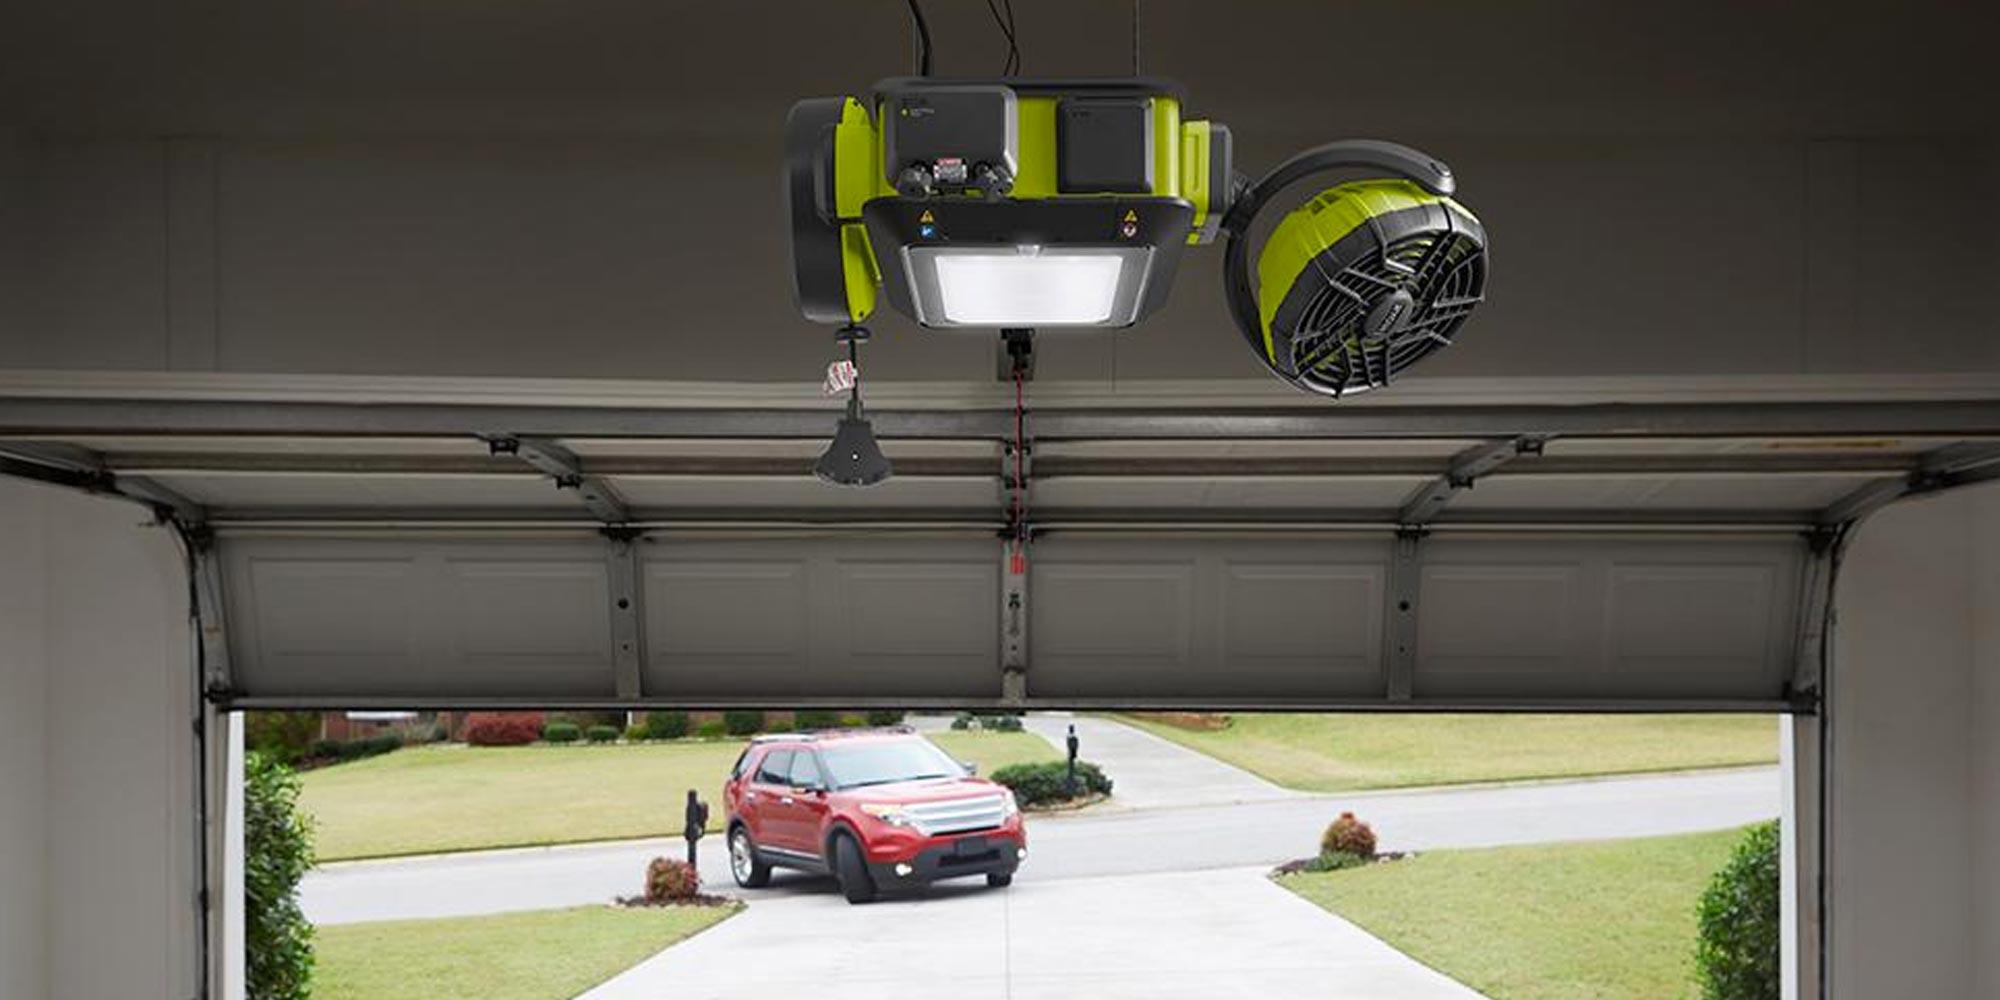 Control your garage door remotely w/ this Ryobi opener for $148 (Reg. $250)